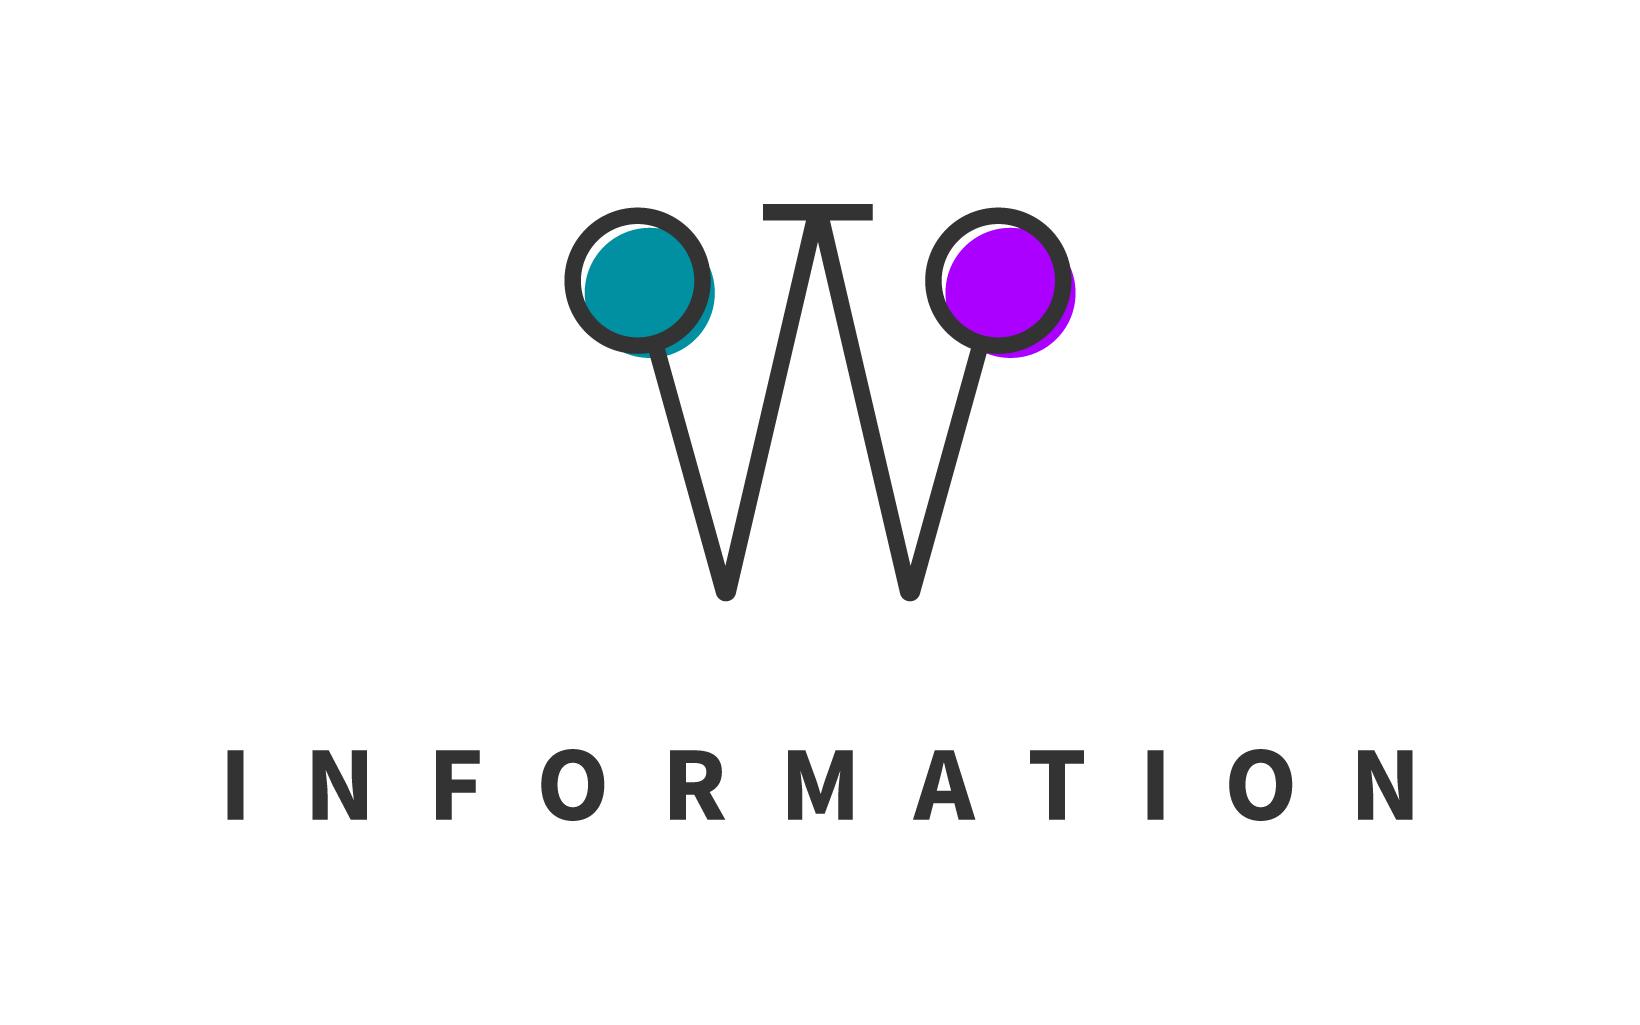 CMS/WordPressを使用したホームページからの情報発信・情報管理